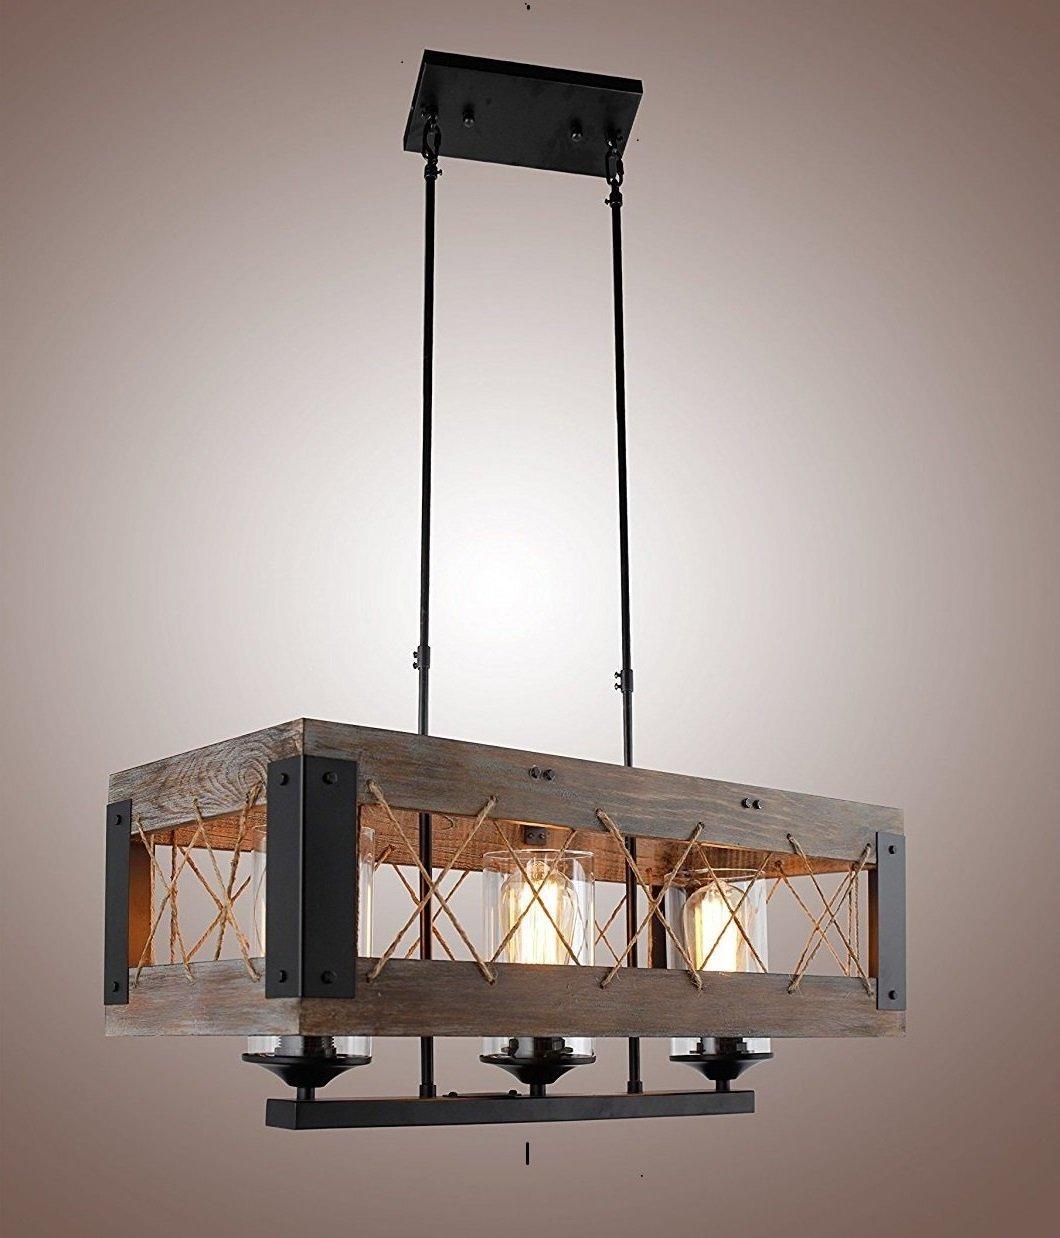 Decomust Island Rectangular Pendant Lighting Chandeliers Kitchen Wood Lighting Hanging,Ceiling Light Fixture Vintage Rustic Oil Black (24 Inches (3 Lights))